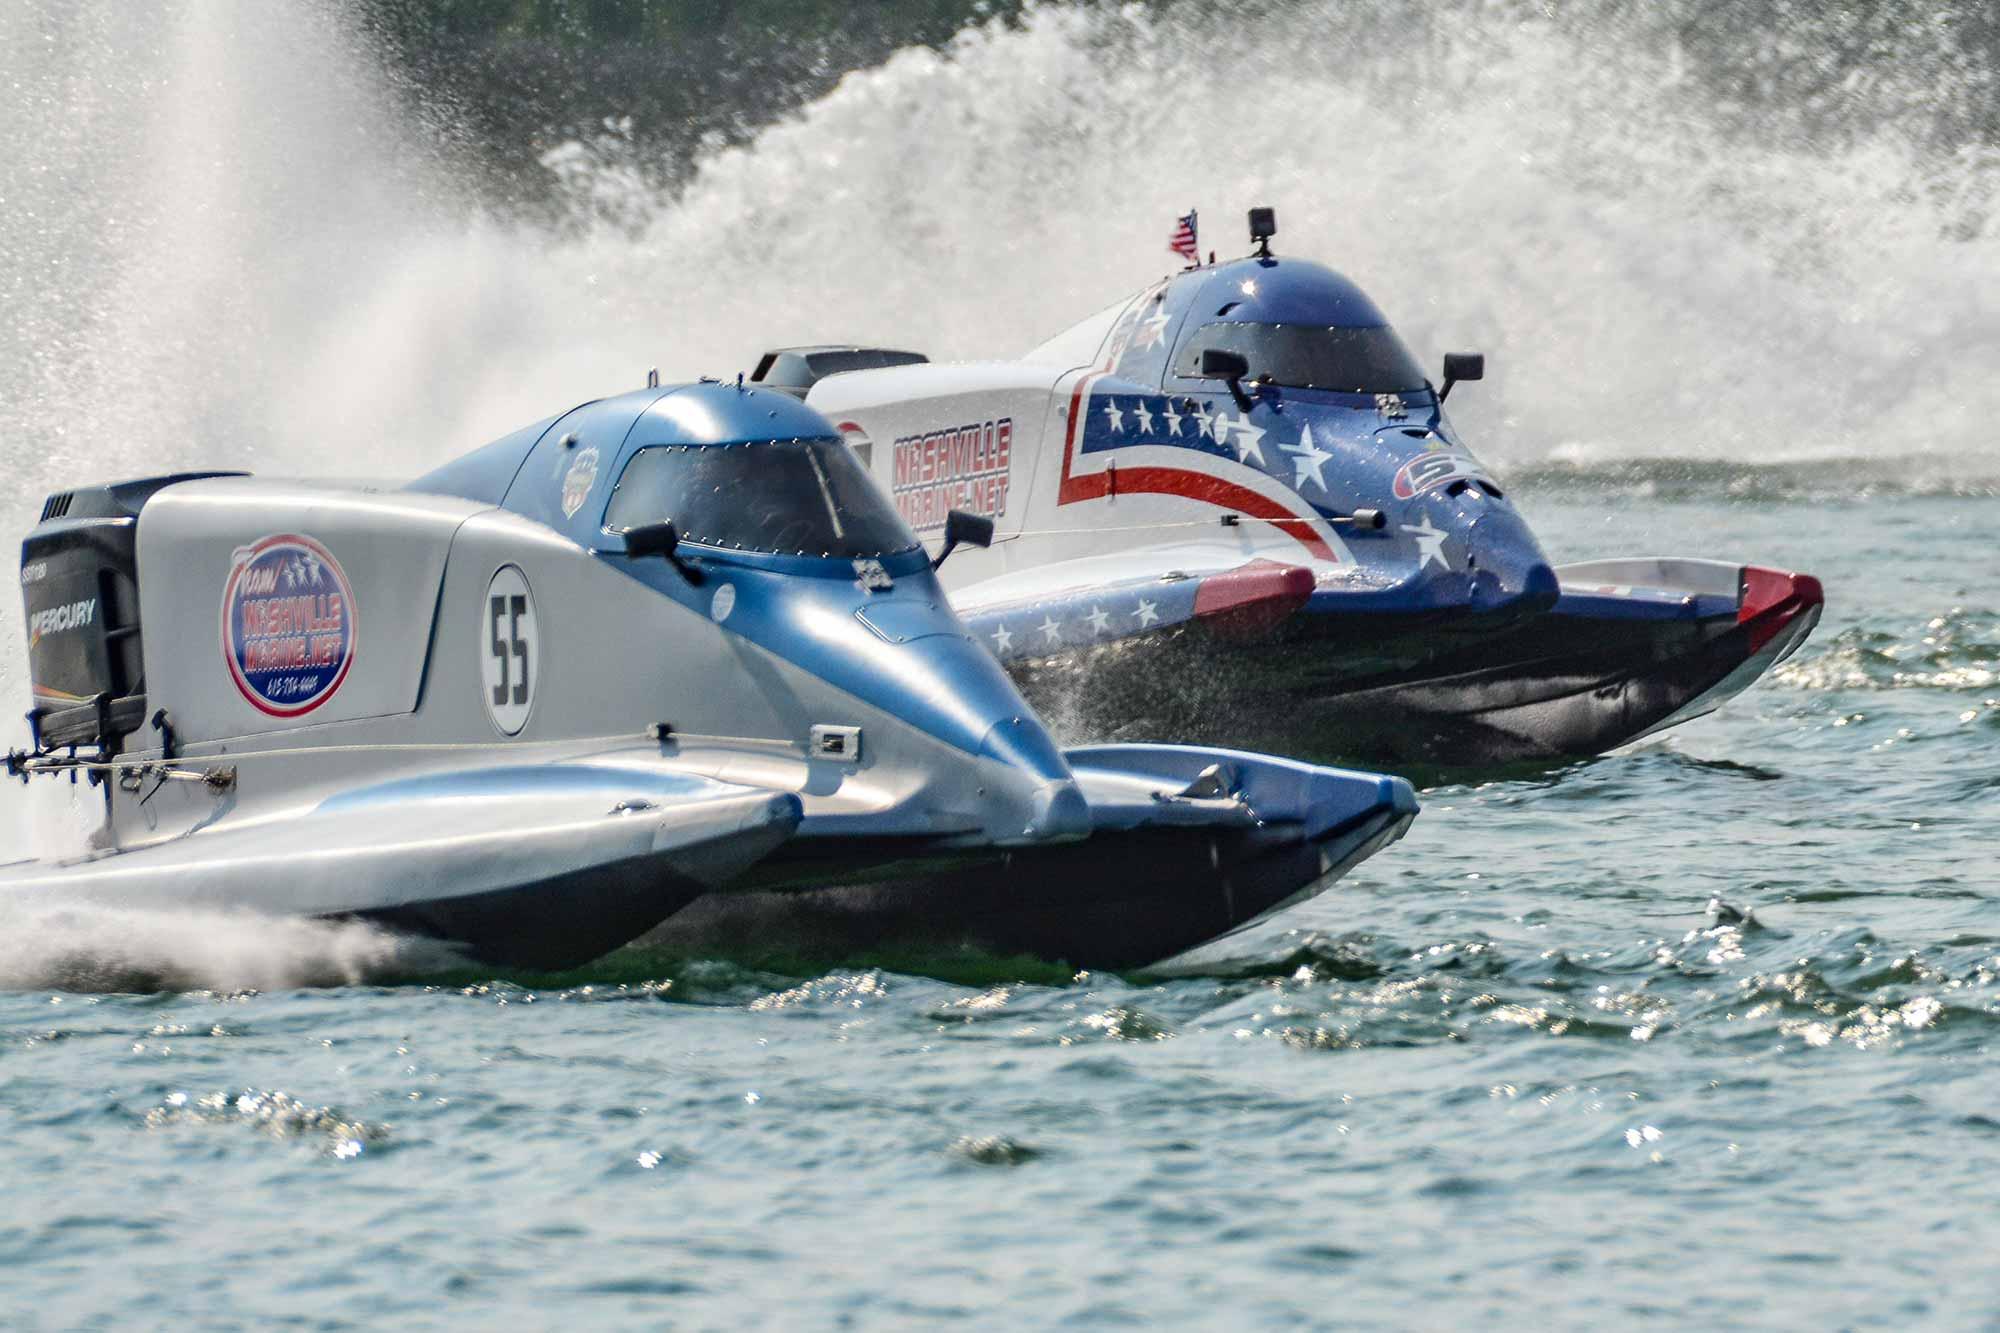 McMurray-Racing-Nashvill-Marine-2021-Springfield-F1-Race-63